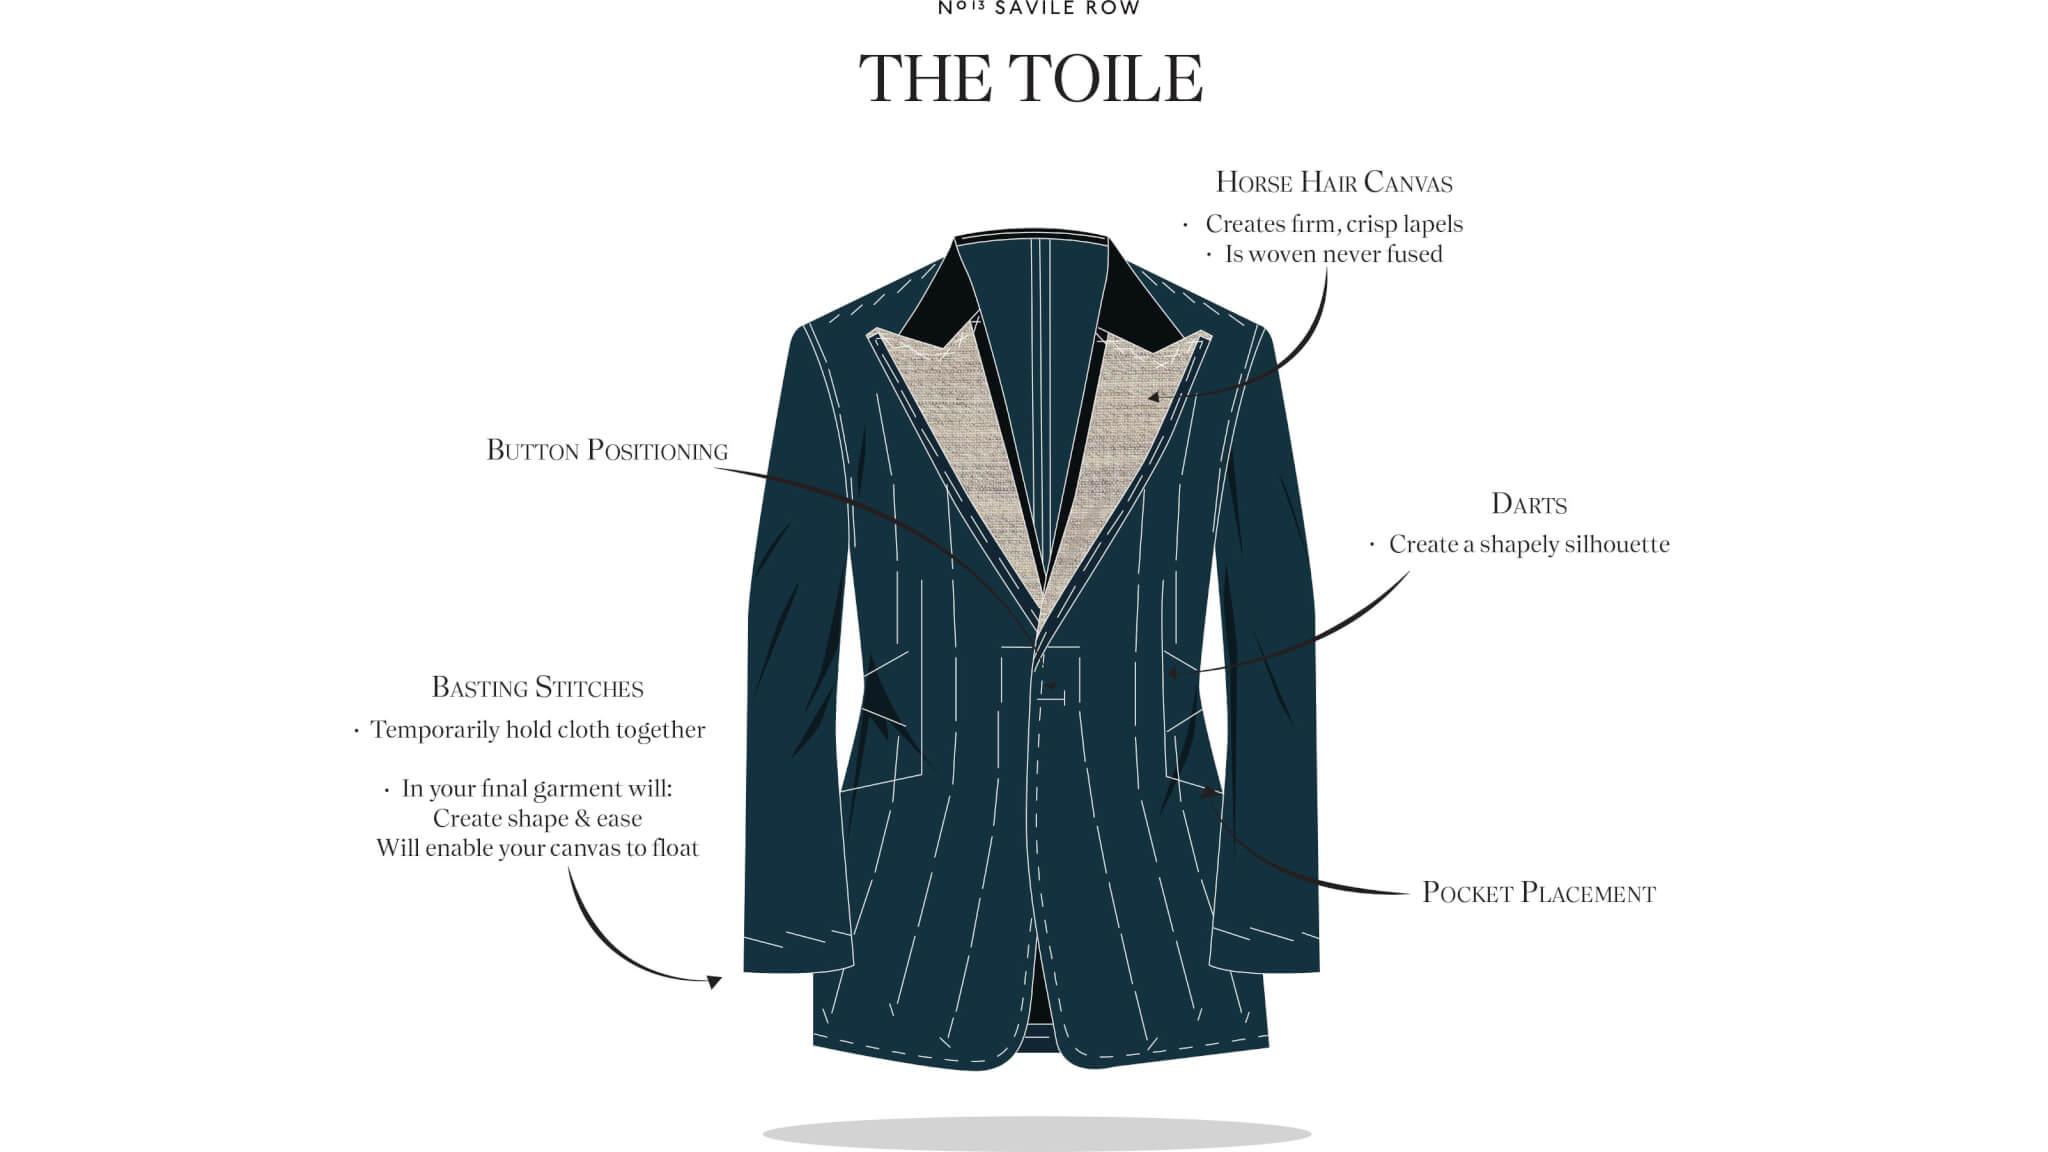 bespoke-toile-savile-row-tailor